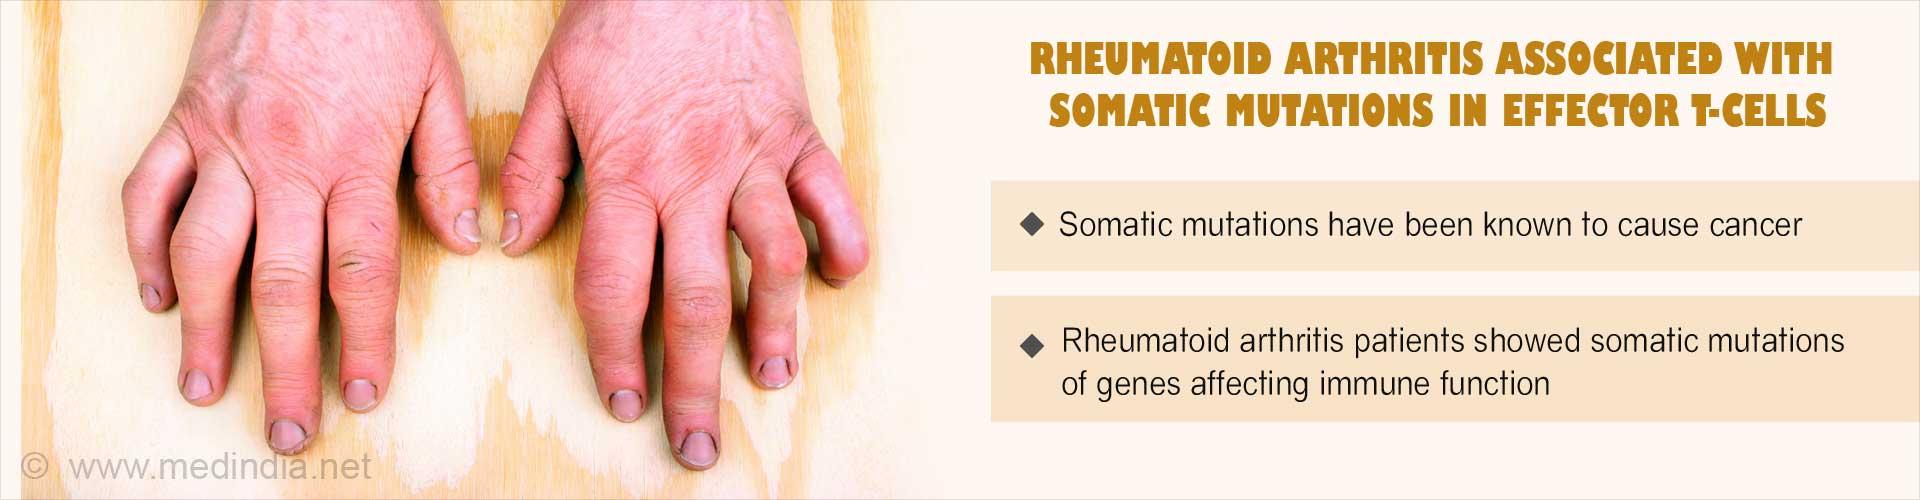 Rheumatoid Arthritis: Somatic Mutations In Mature T-Cells Unearthed